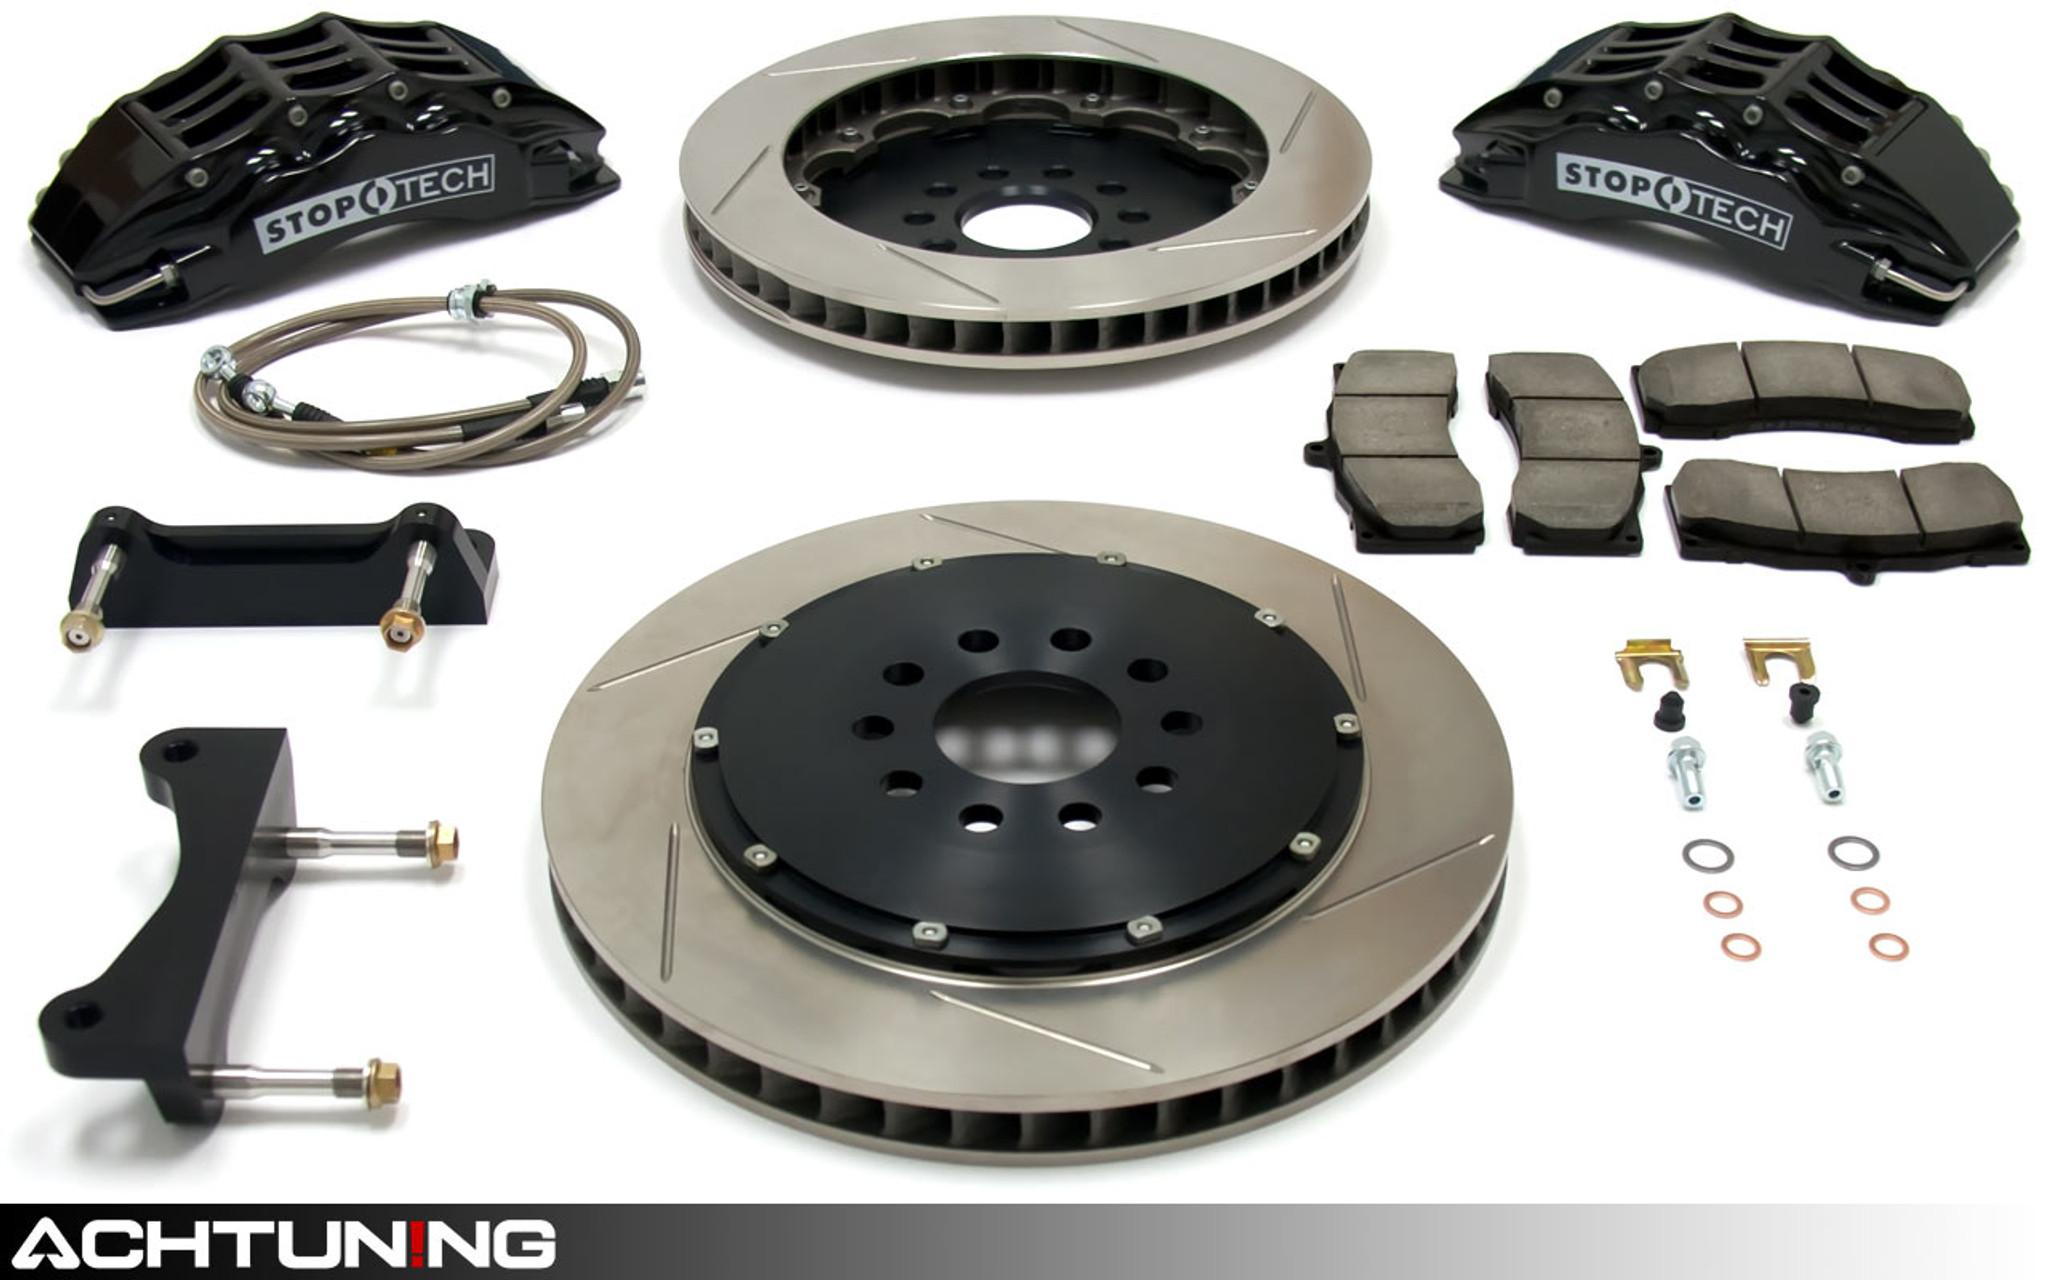 Max Brakes Front /& Rear Elite Brake Kit TA147583 E-Coated Slotted Drilled Rotors + Metallic Pads Fits: 2013 13 Hyundai Genesis Cpe w//4 Piston Calipers